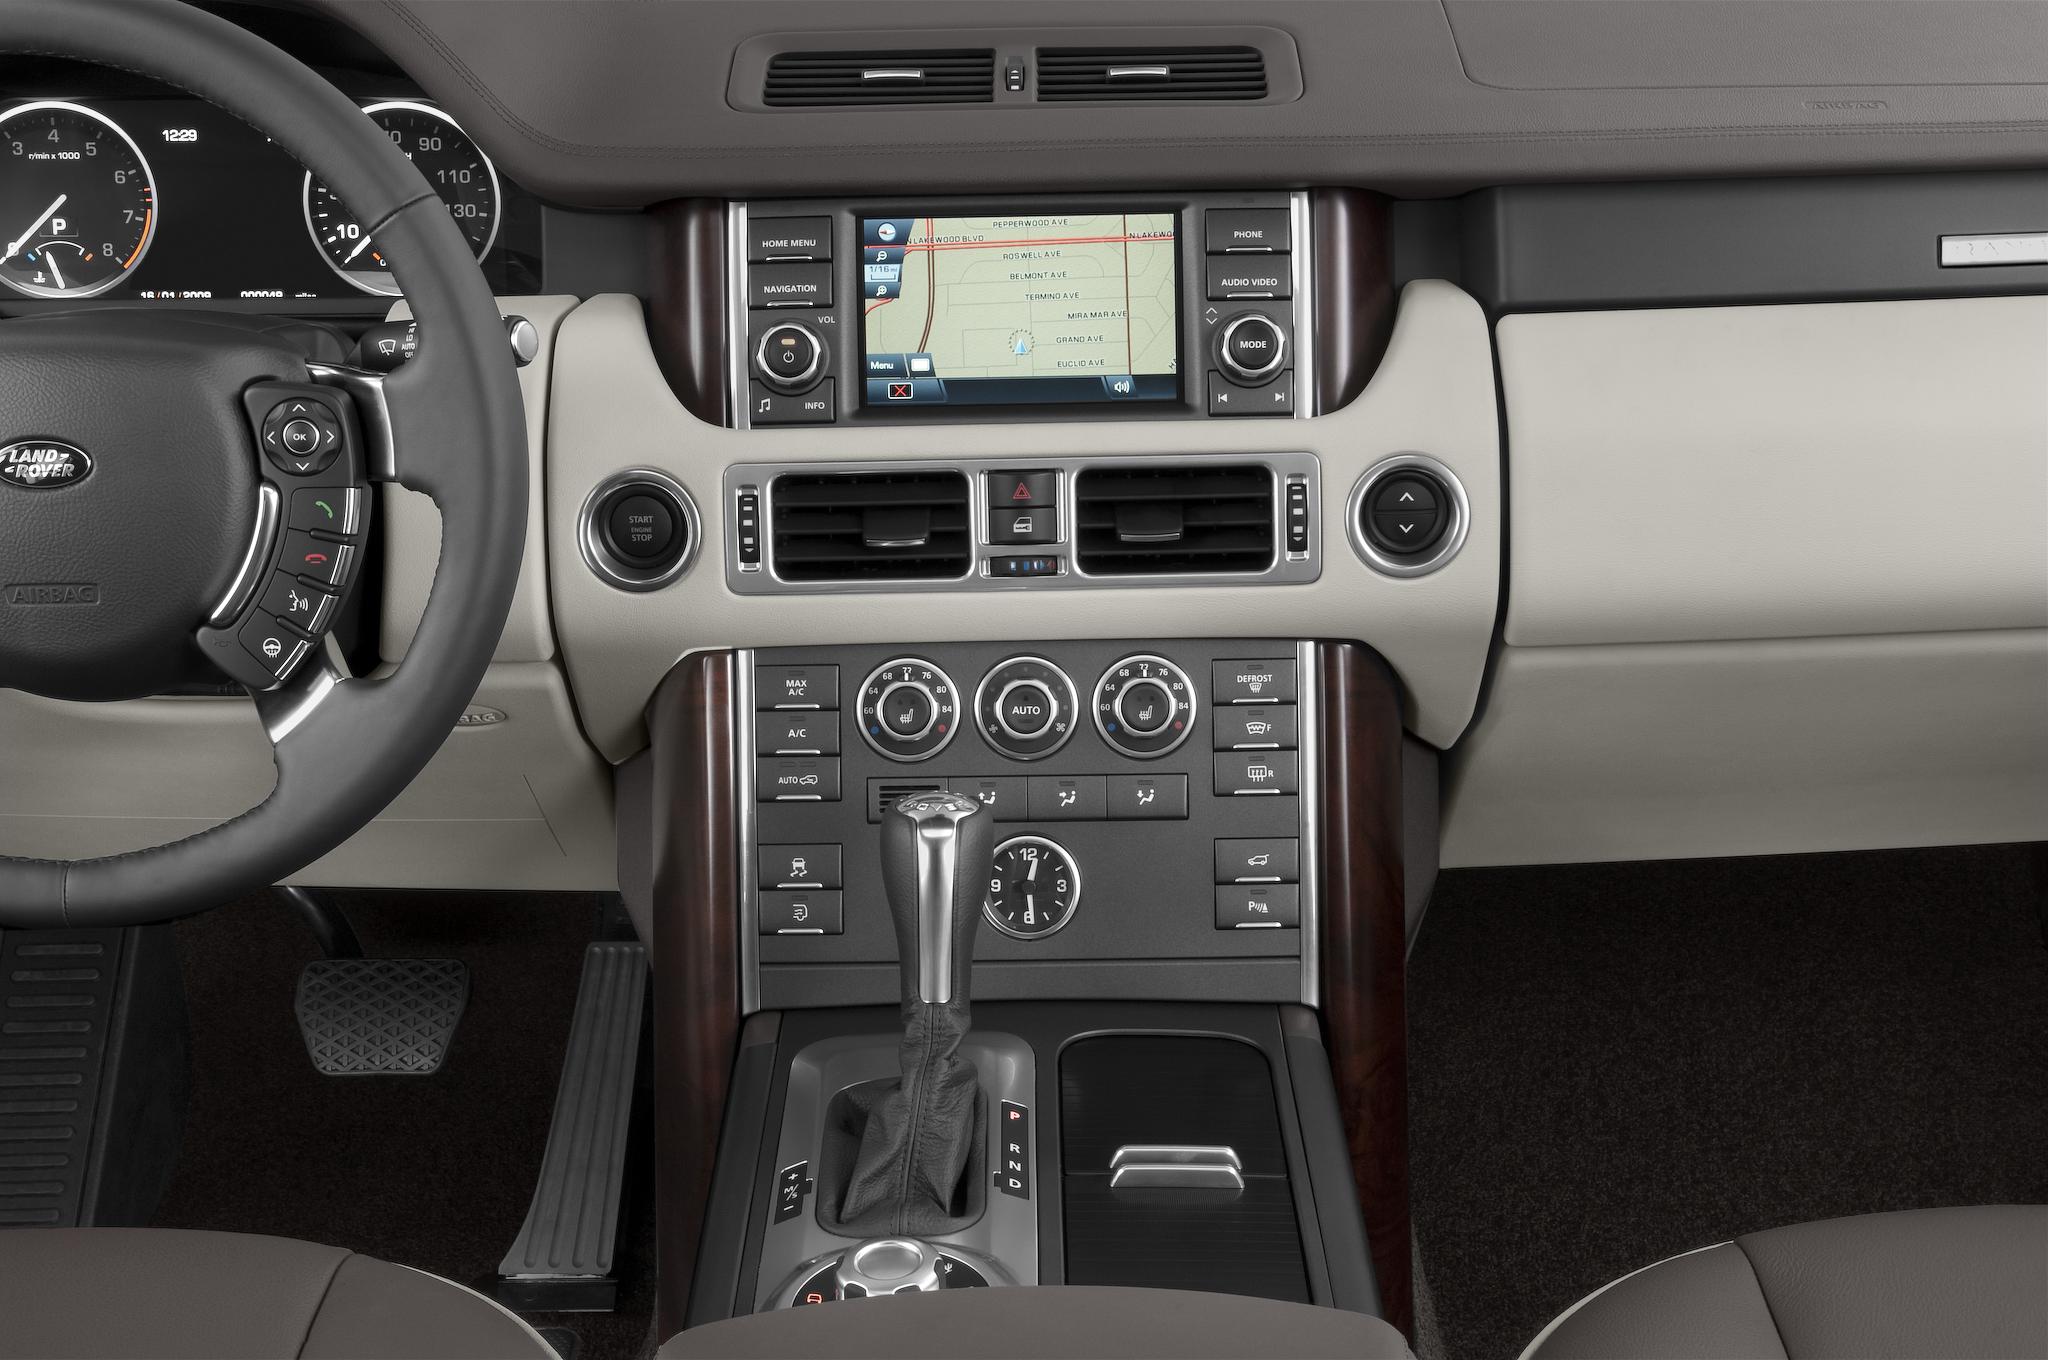 http://st.automobilemag.com/uploads/sites/10/2015/11/2010-land-rover-range-rover-hse-suv-instrument-panel.png